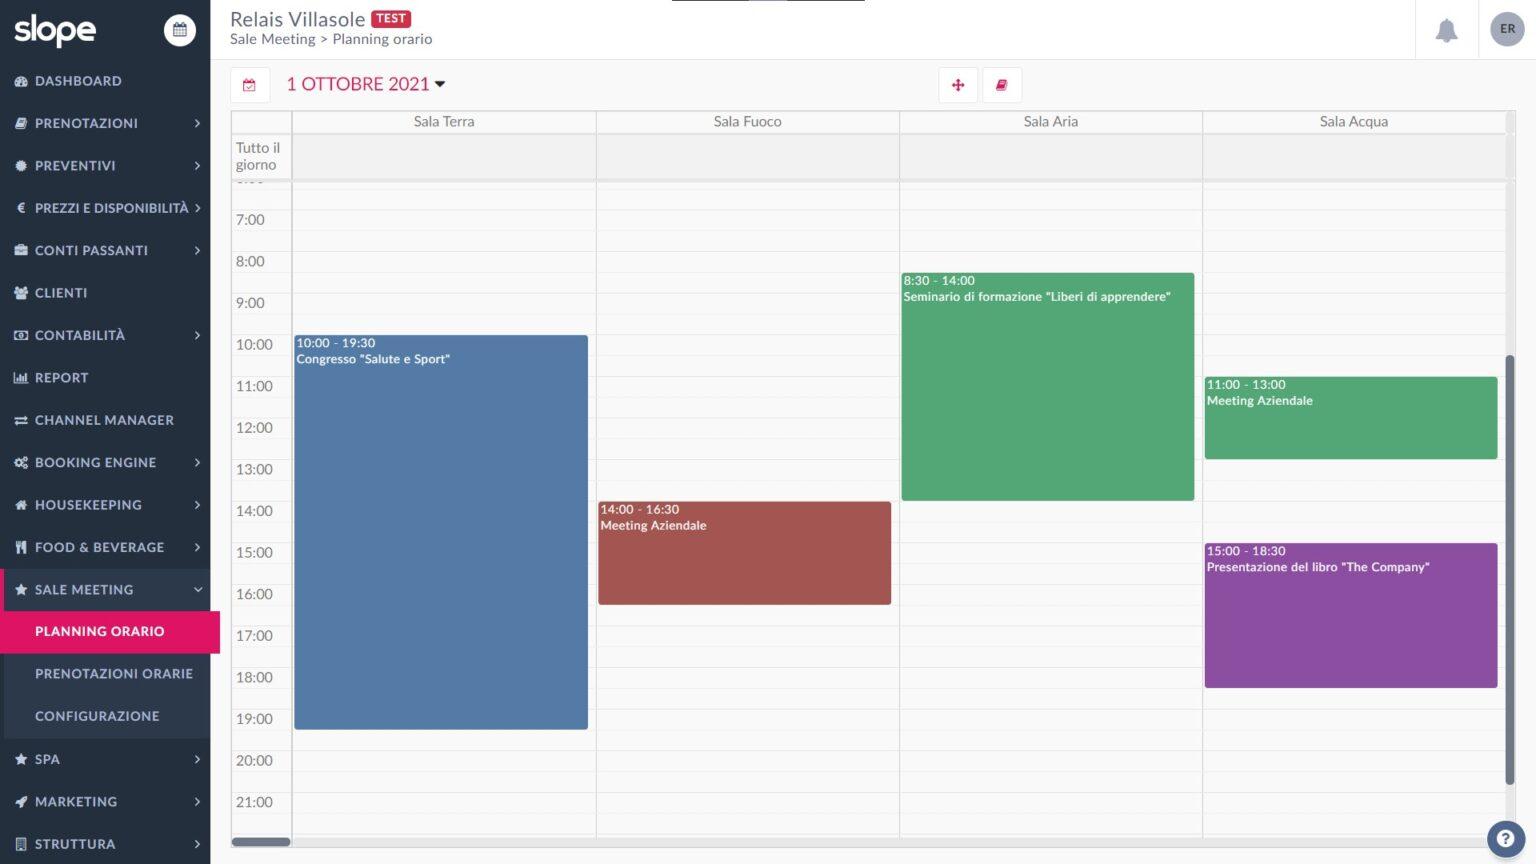 slp-sale-meeting-screenshot-prenotazioni-orarie.jpg